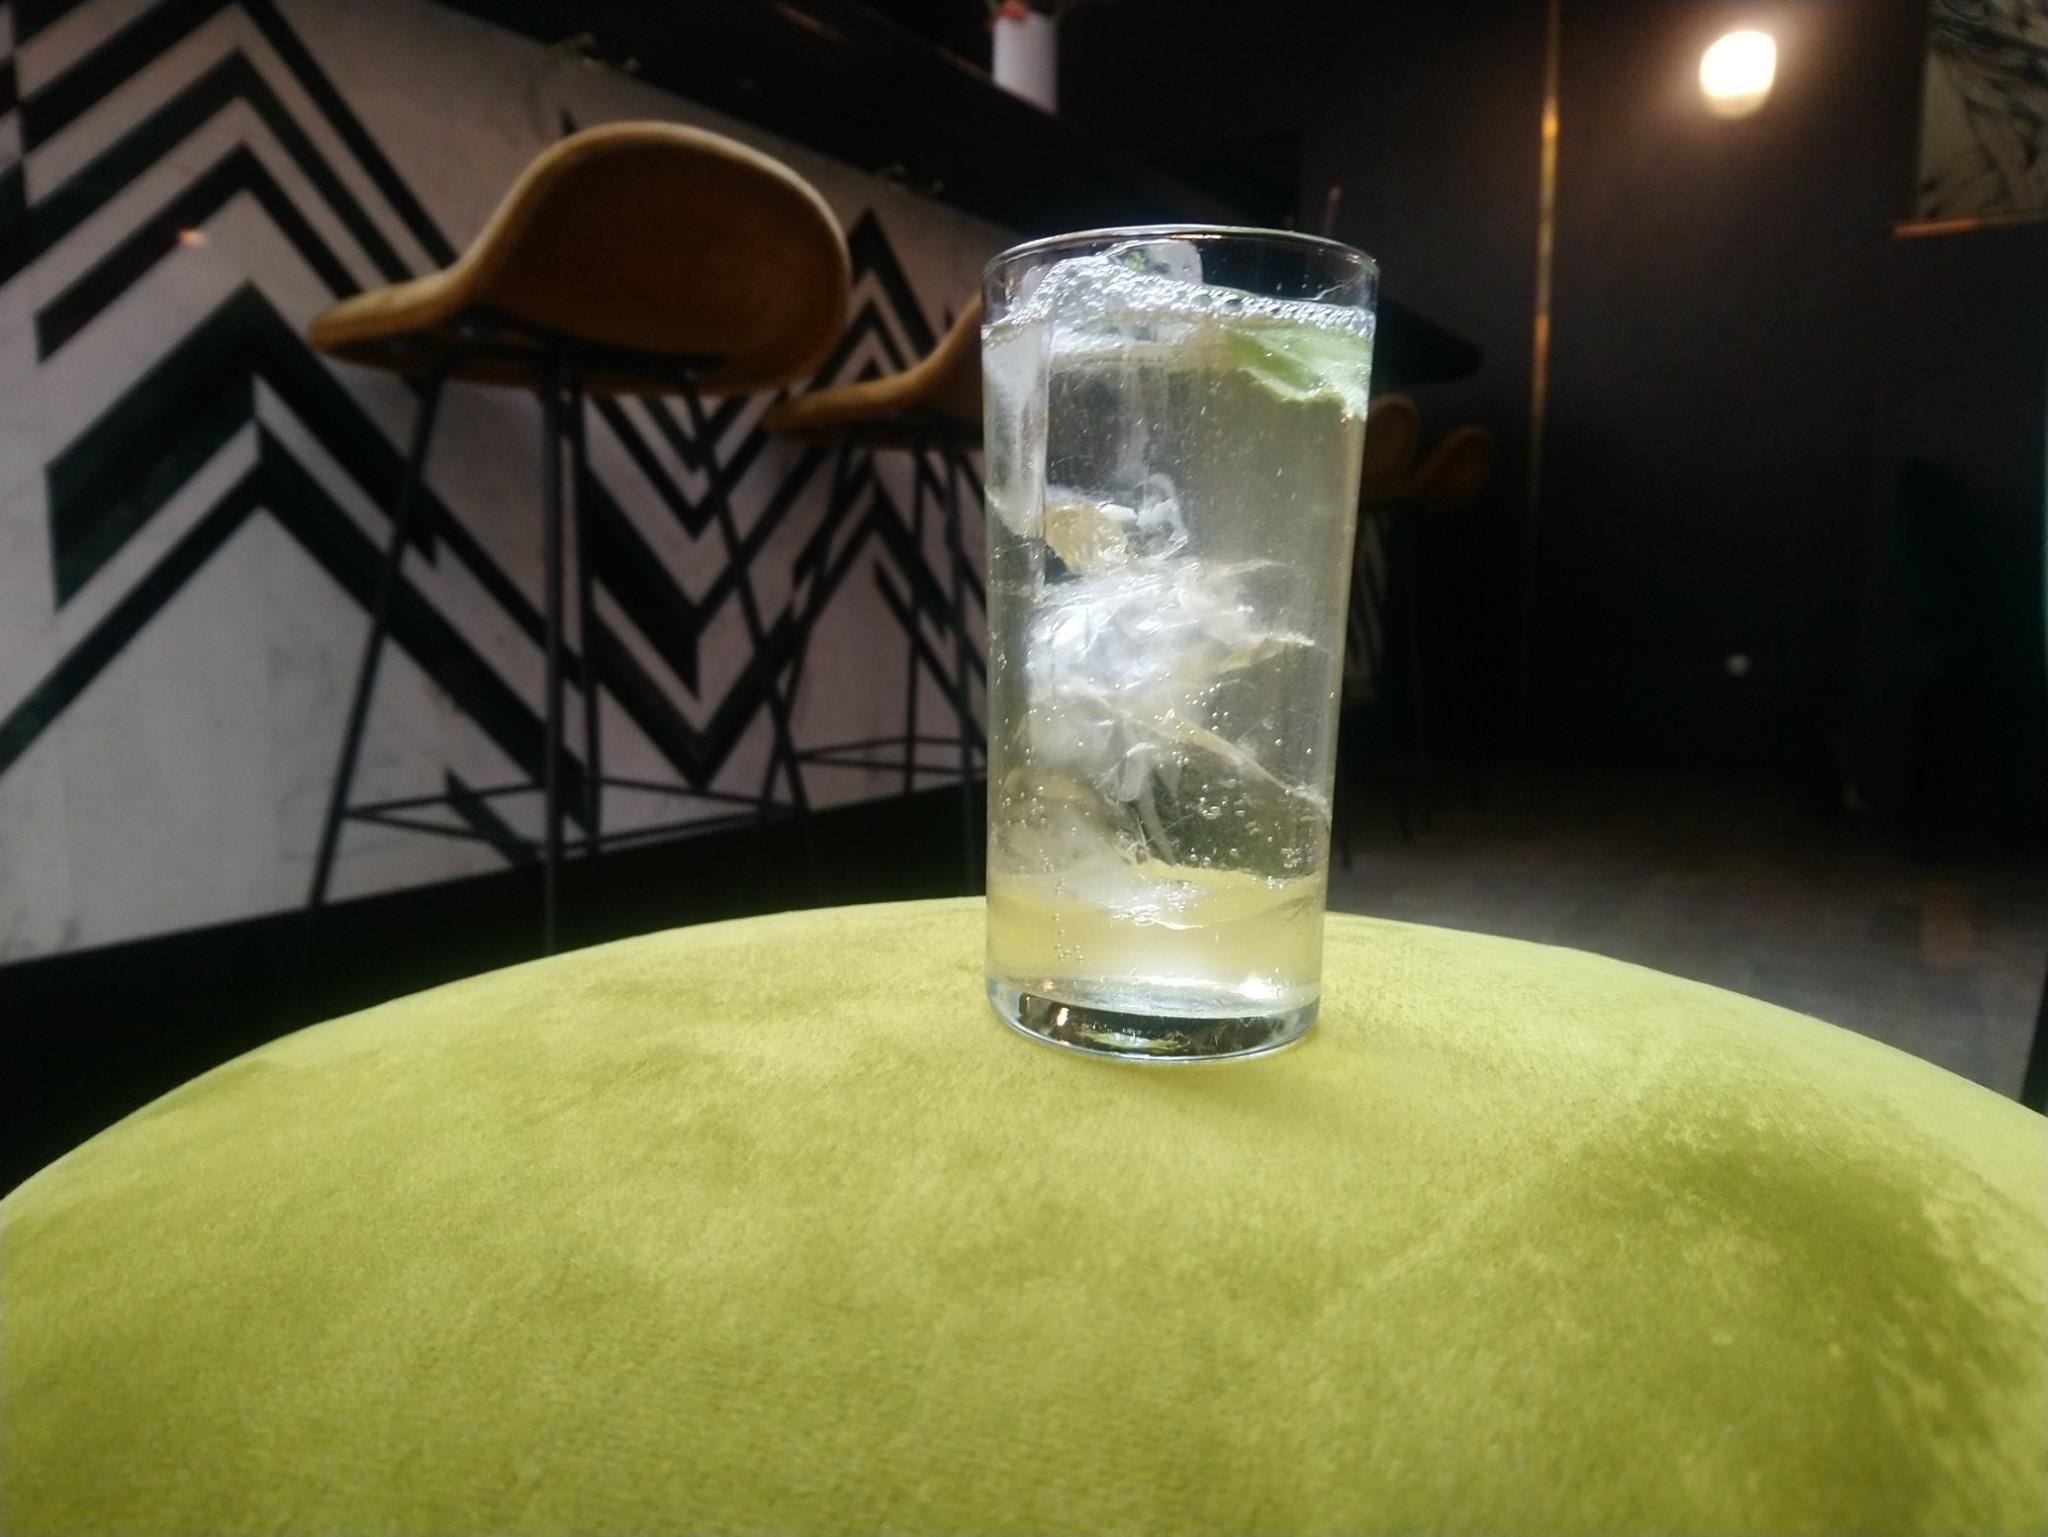 Bar Danico à Paris - Cocktail Summer in Normandy